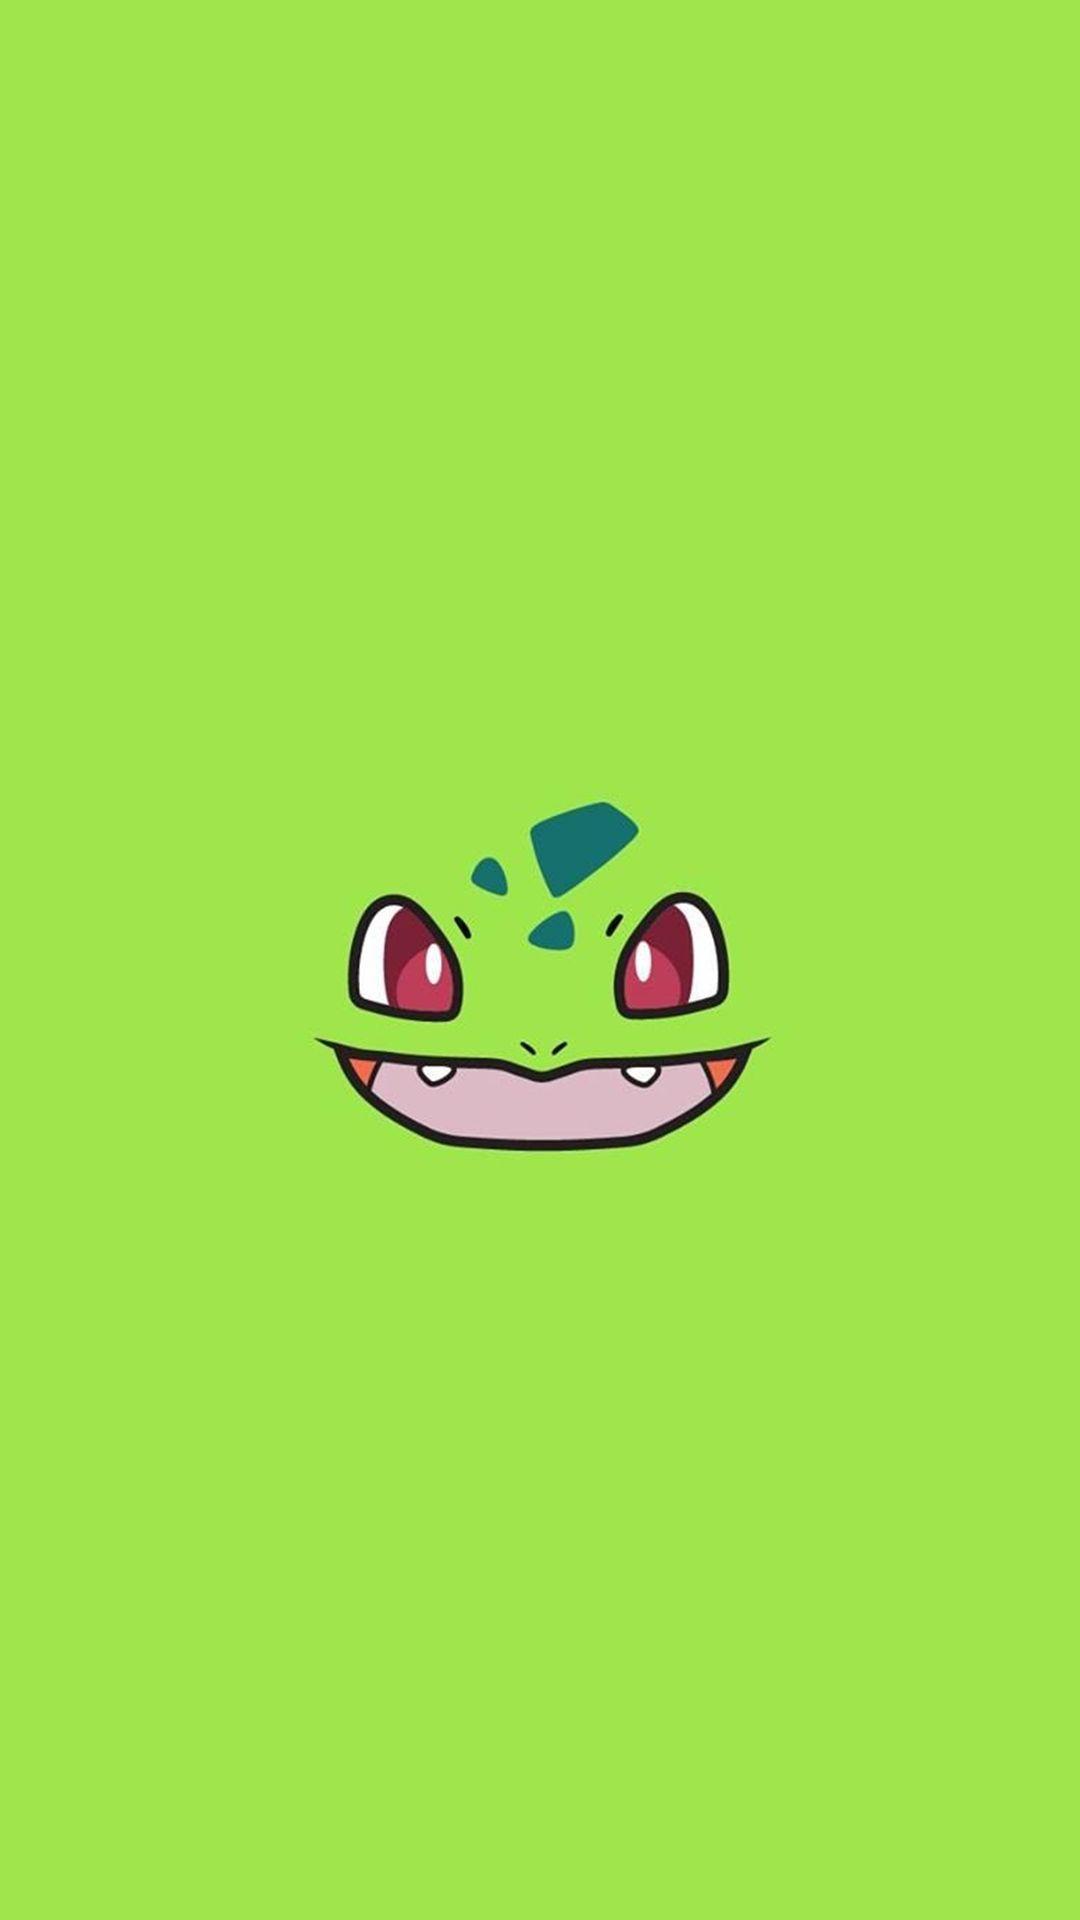 Beautiful Wallpaper Mobile Pokemon - 6da9d6a3bbc85442a7a26cb2c4c94703  You Should Have_331129.jpg